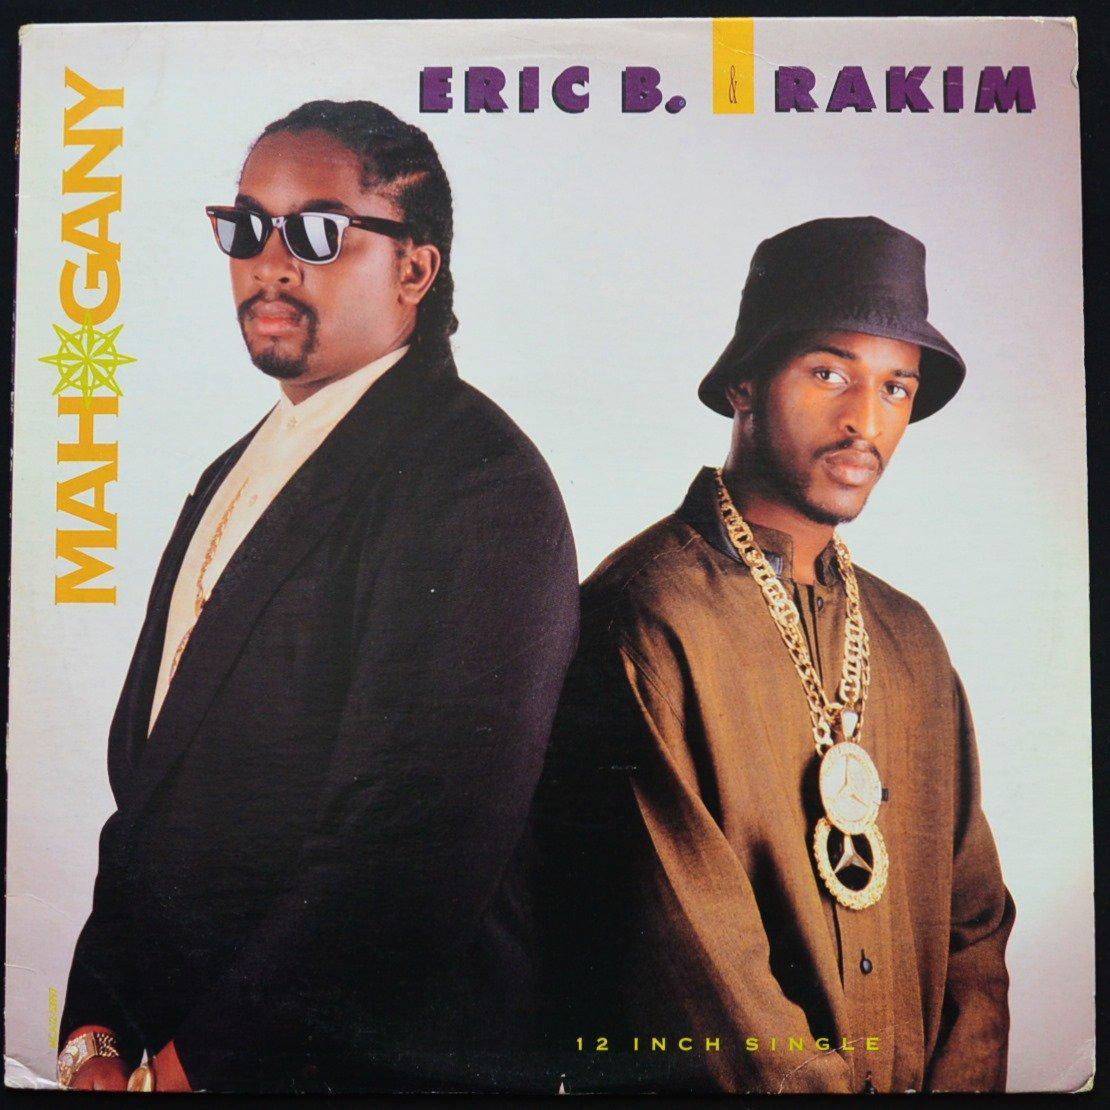 ERIC B. & RAKIM / MAHOGANY - EXTENDED REMIX / NO OMEGA - EXTENDED REMIX (12